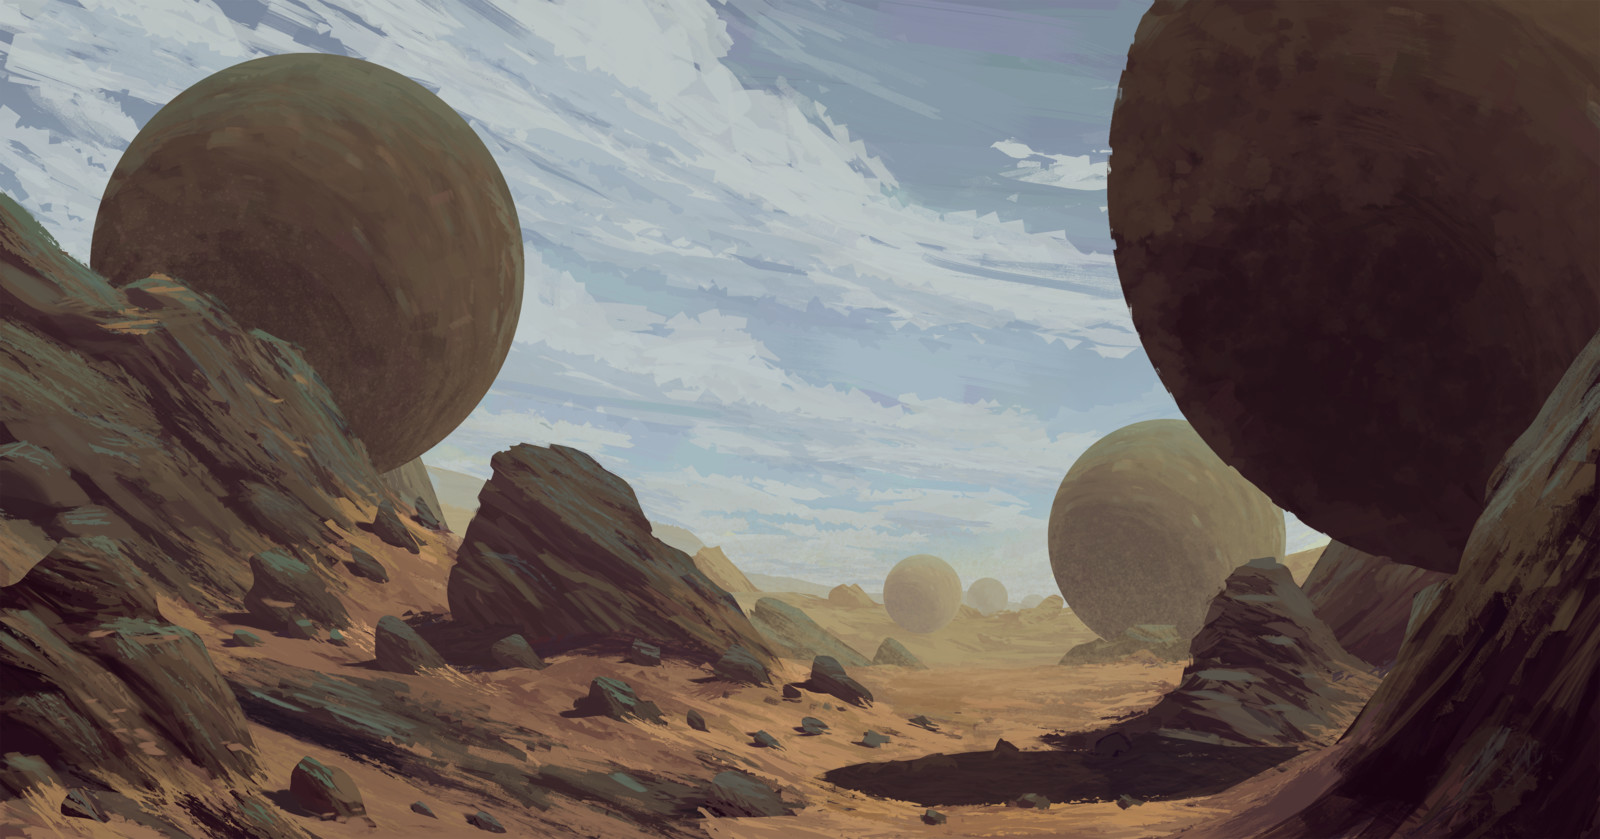 2D environments